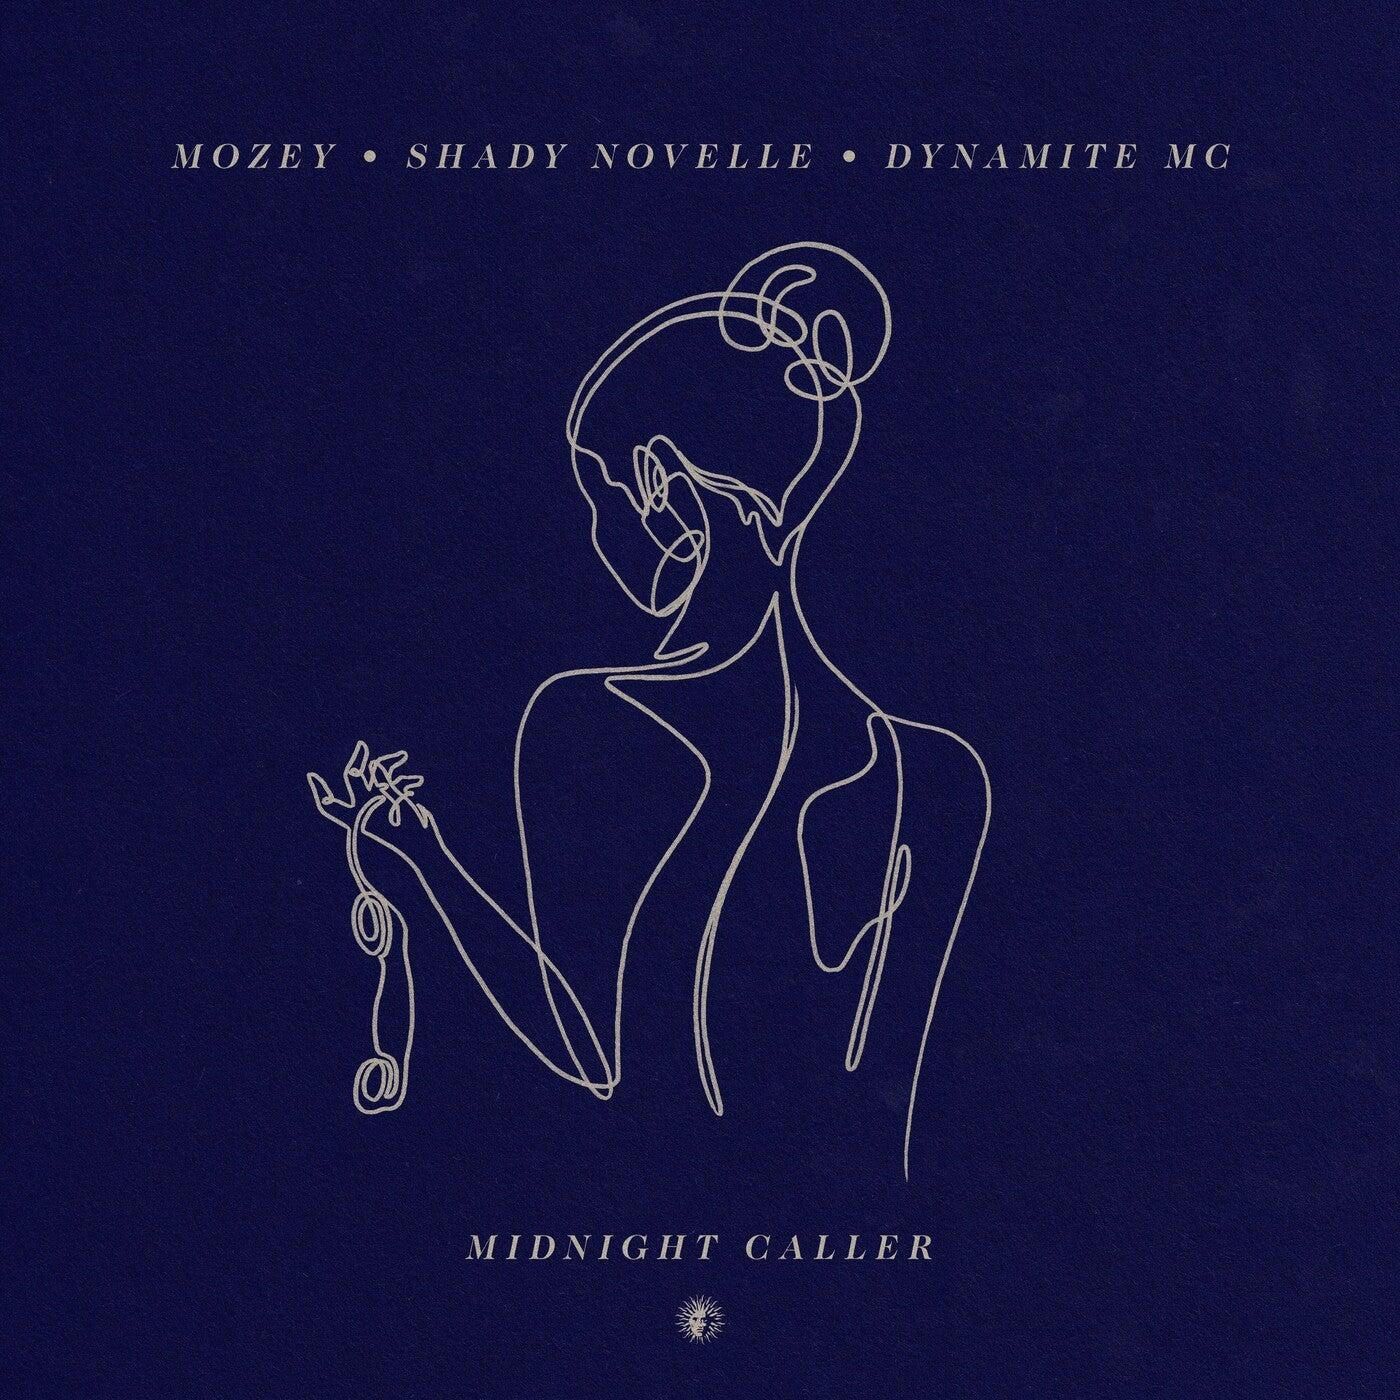 Midnight Caller (Original Mix)